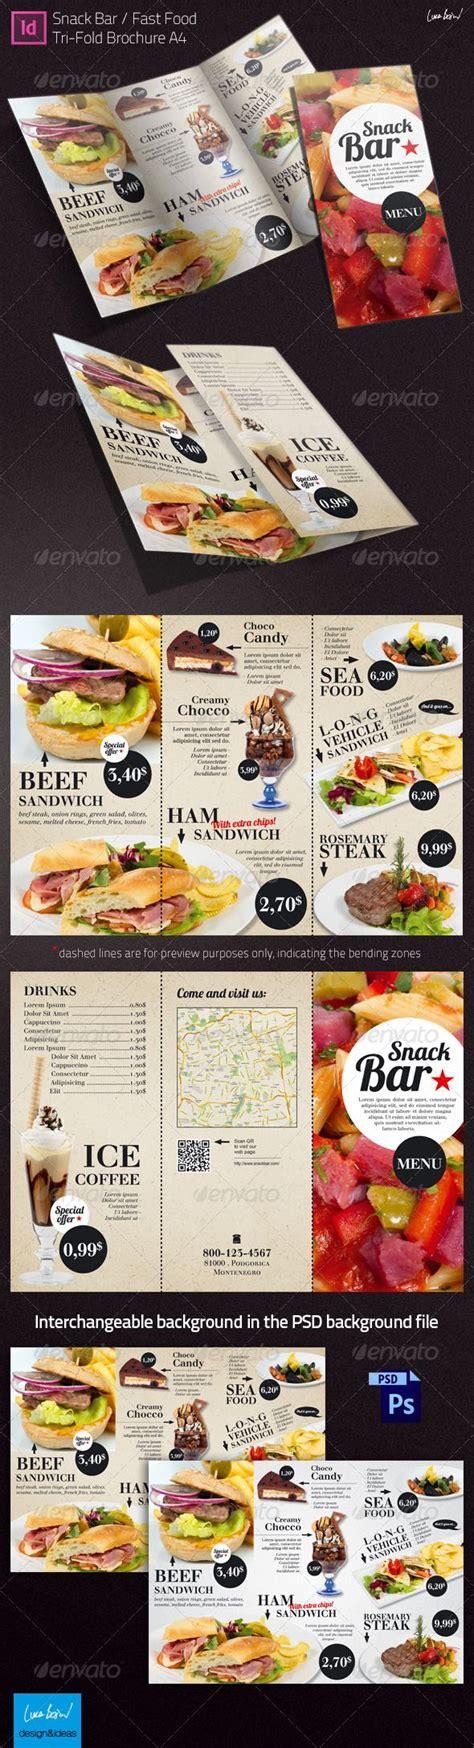 Snack Bar Menu Template by Tri Fold Brochure Snack Bar Menu Restaurant Texts And